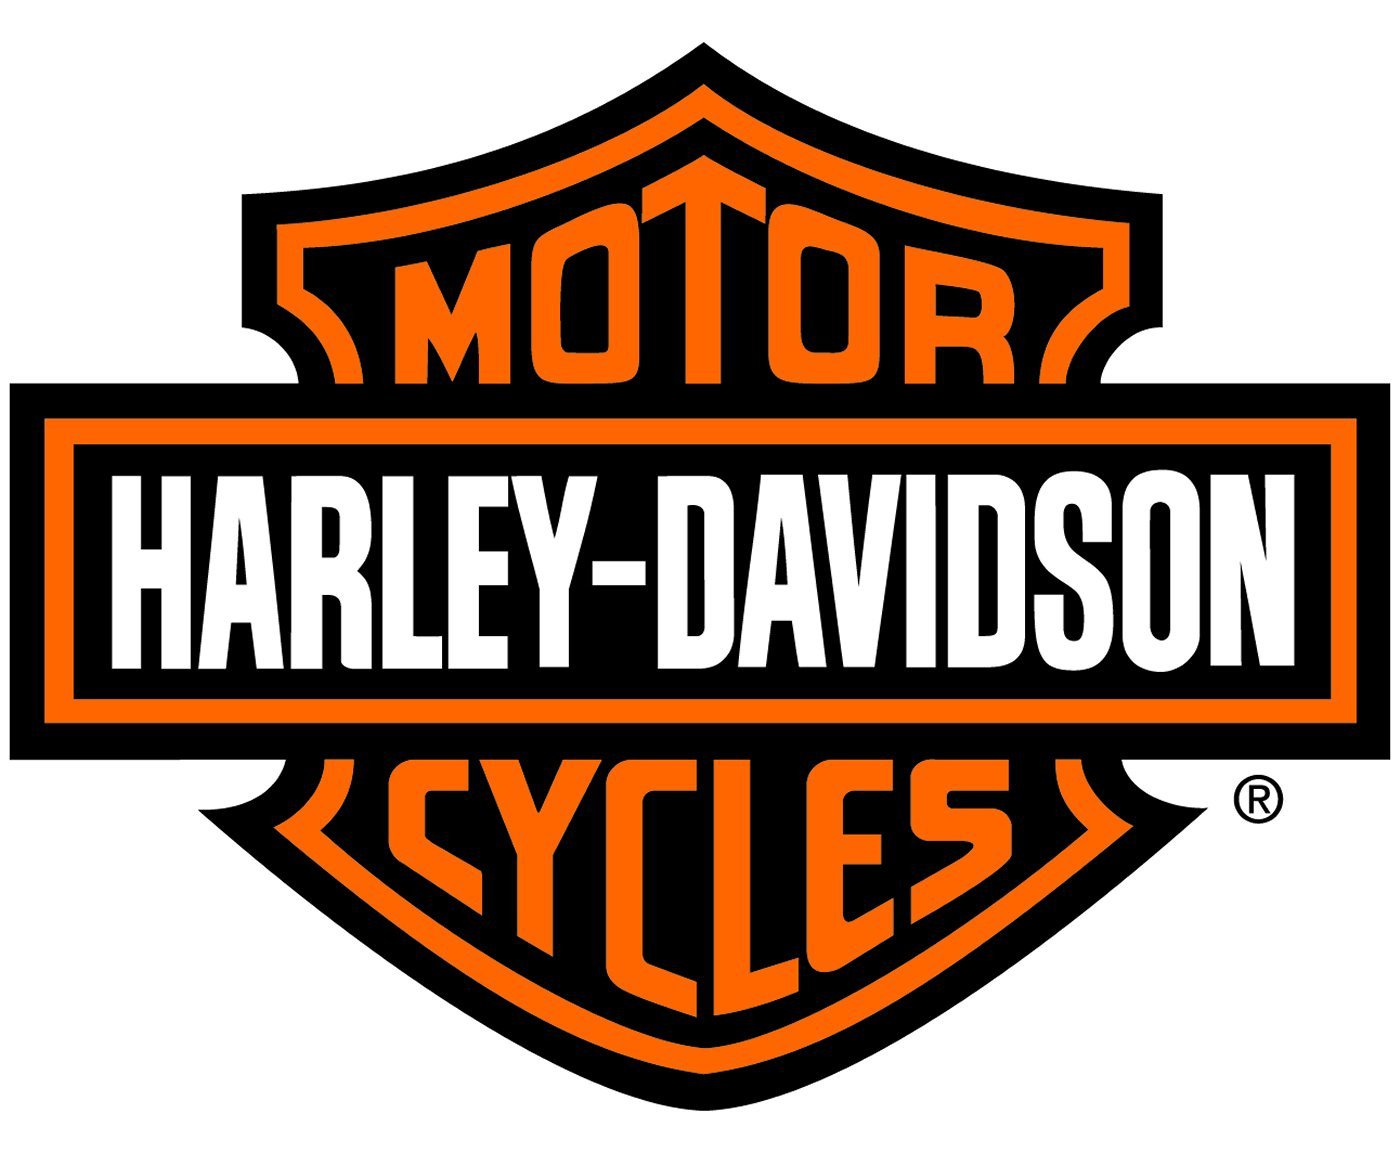 Harley Davidson Logo Wallpaper: Logo Harley Davidson Motor Cycles, HD Bikes, 4k Wallpapers